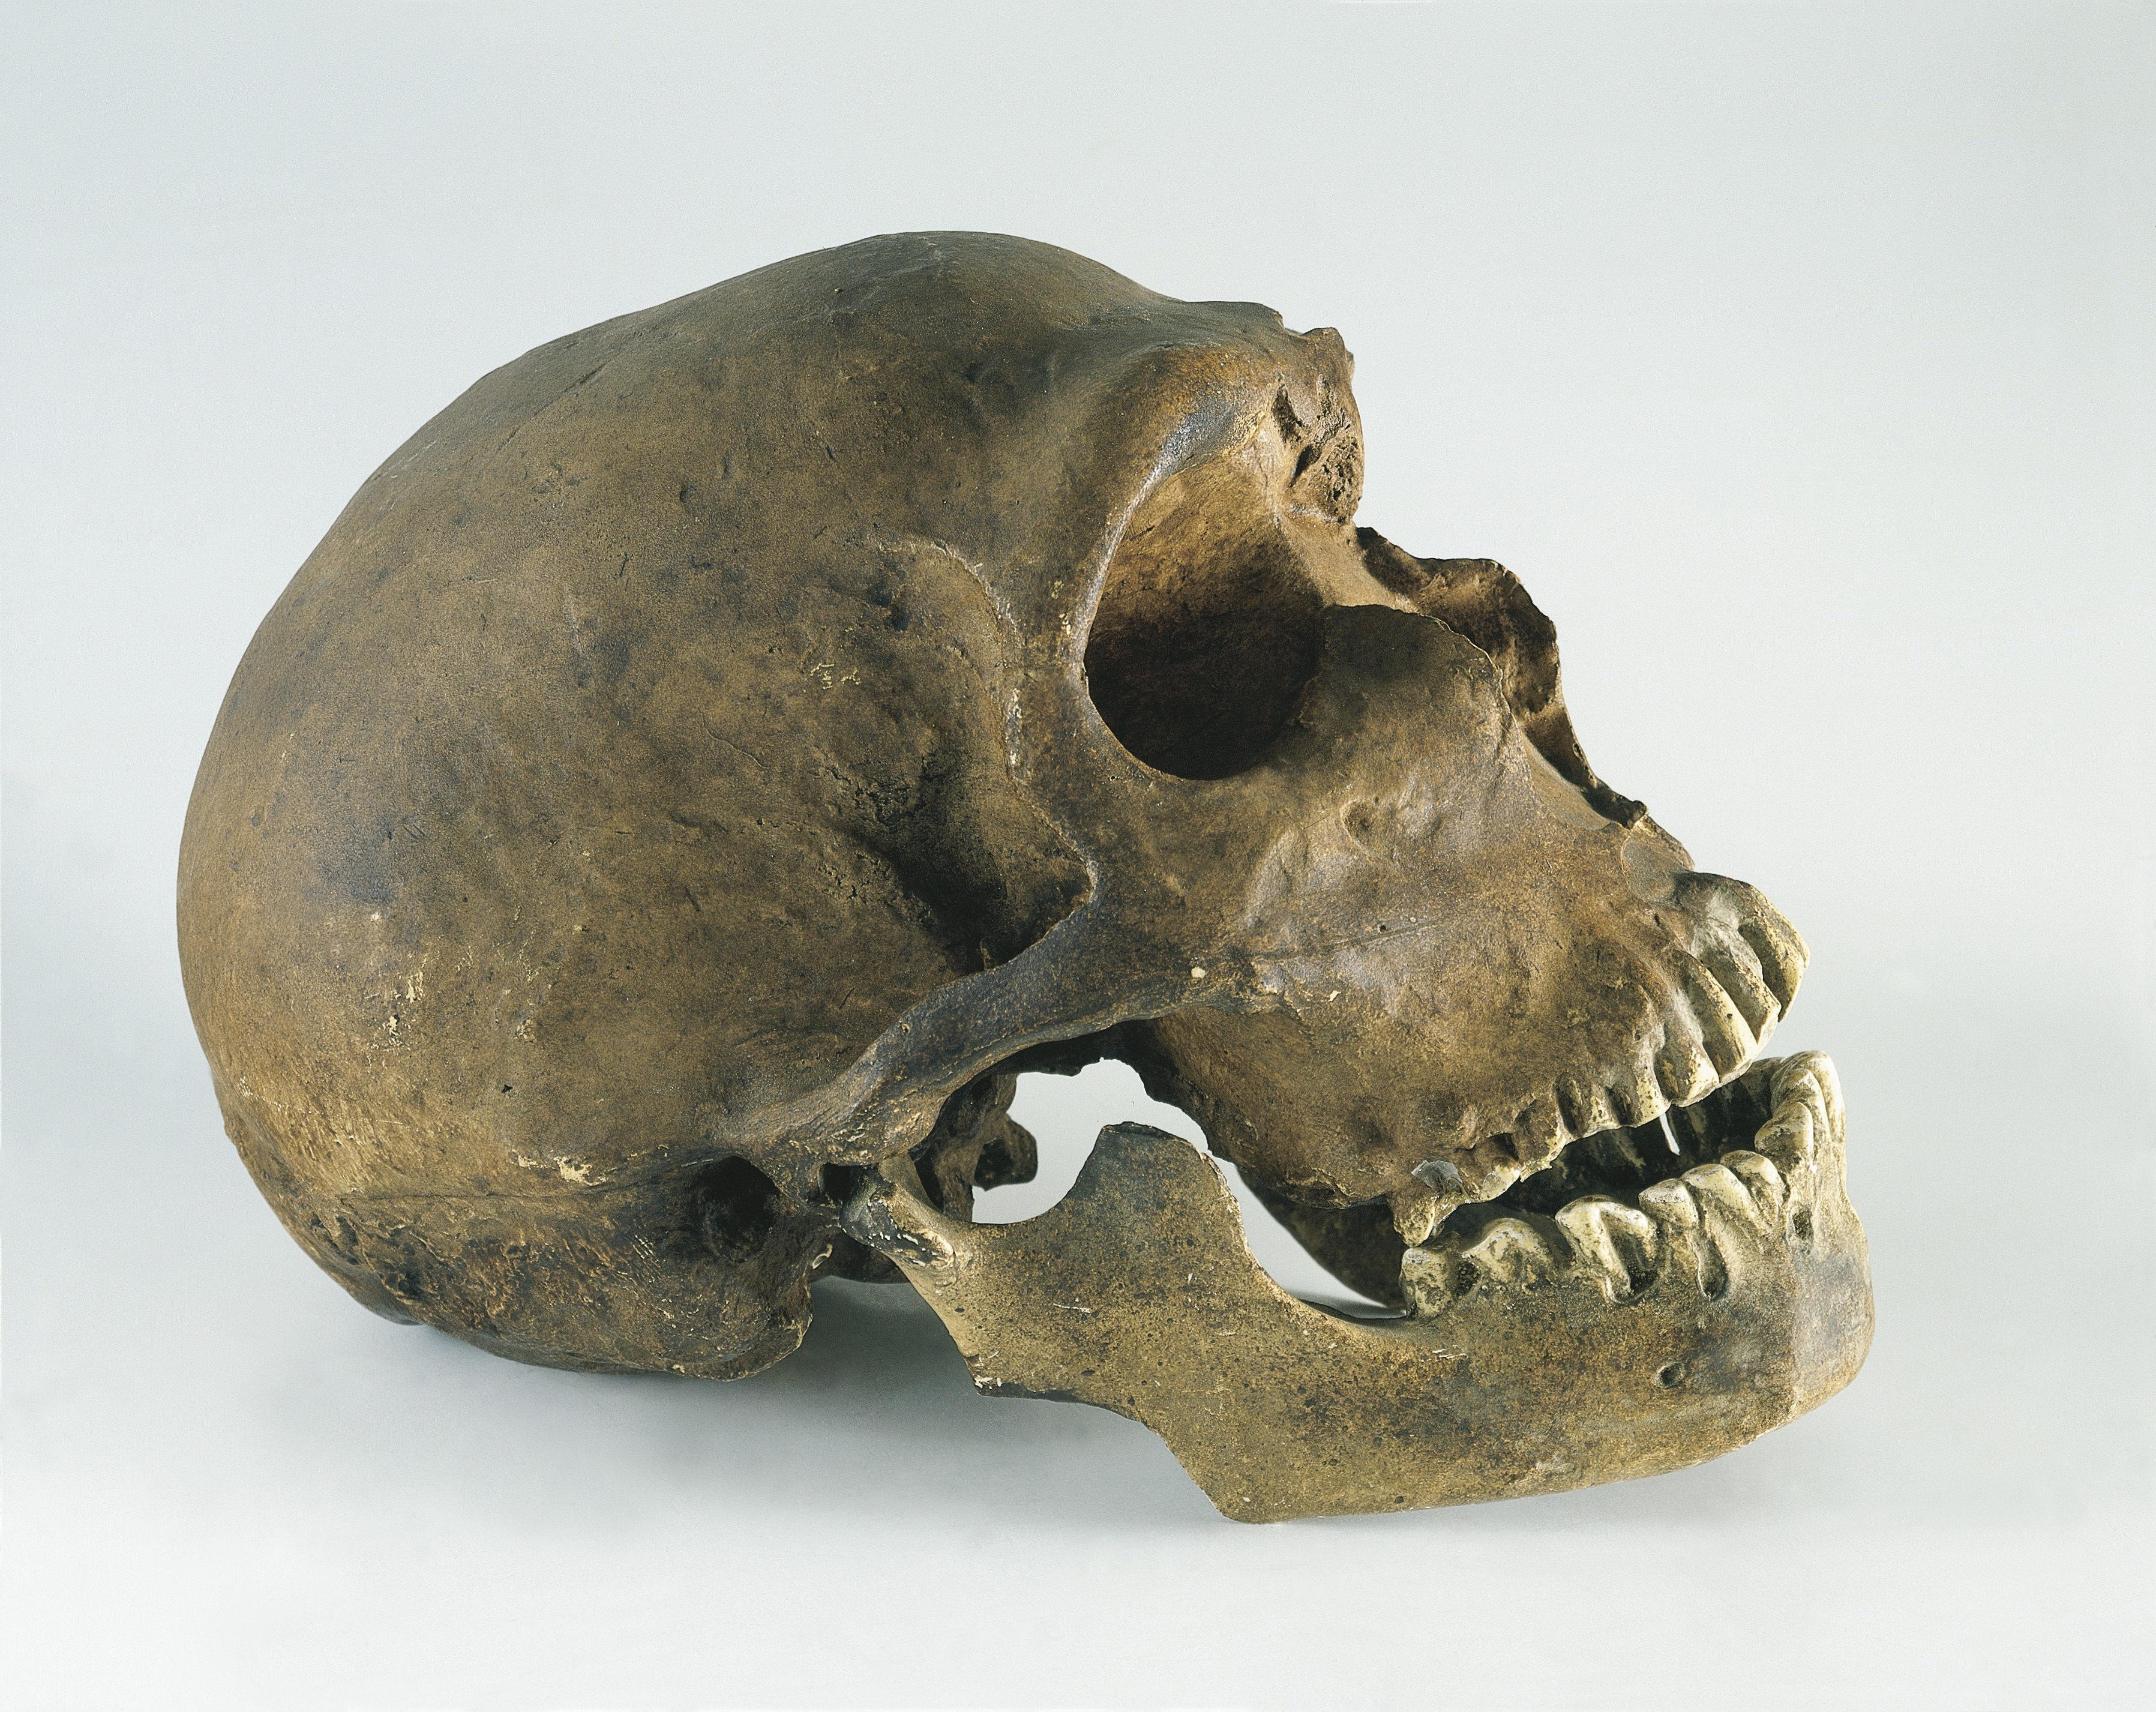 Neanderthals Actually Used 'Aspirin' Just Like